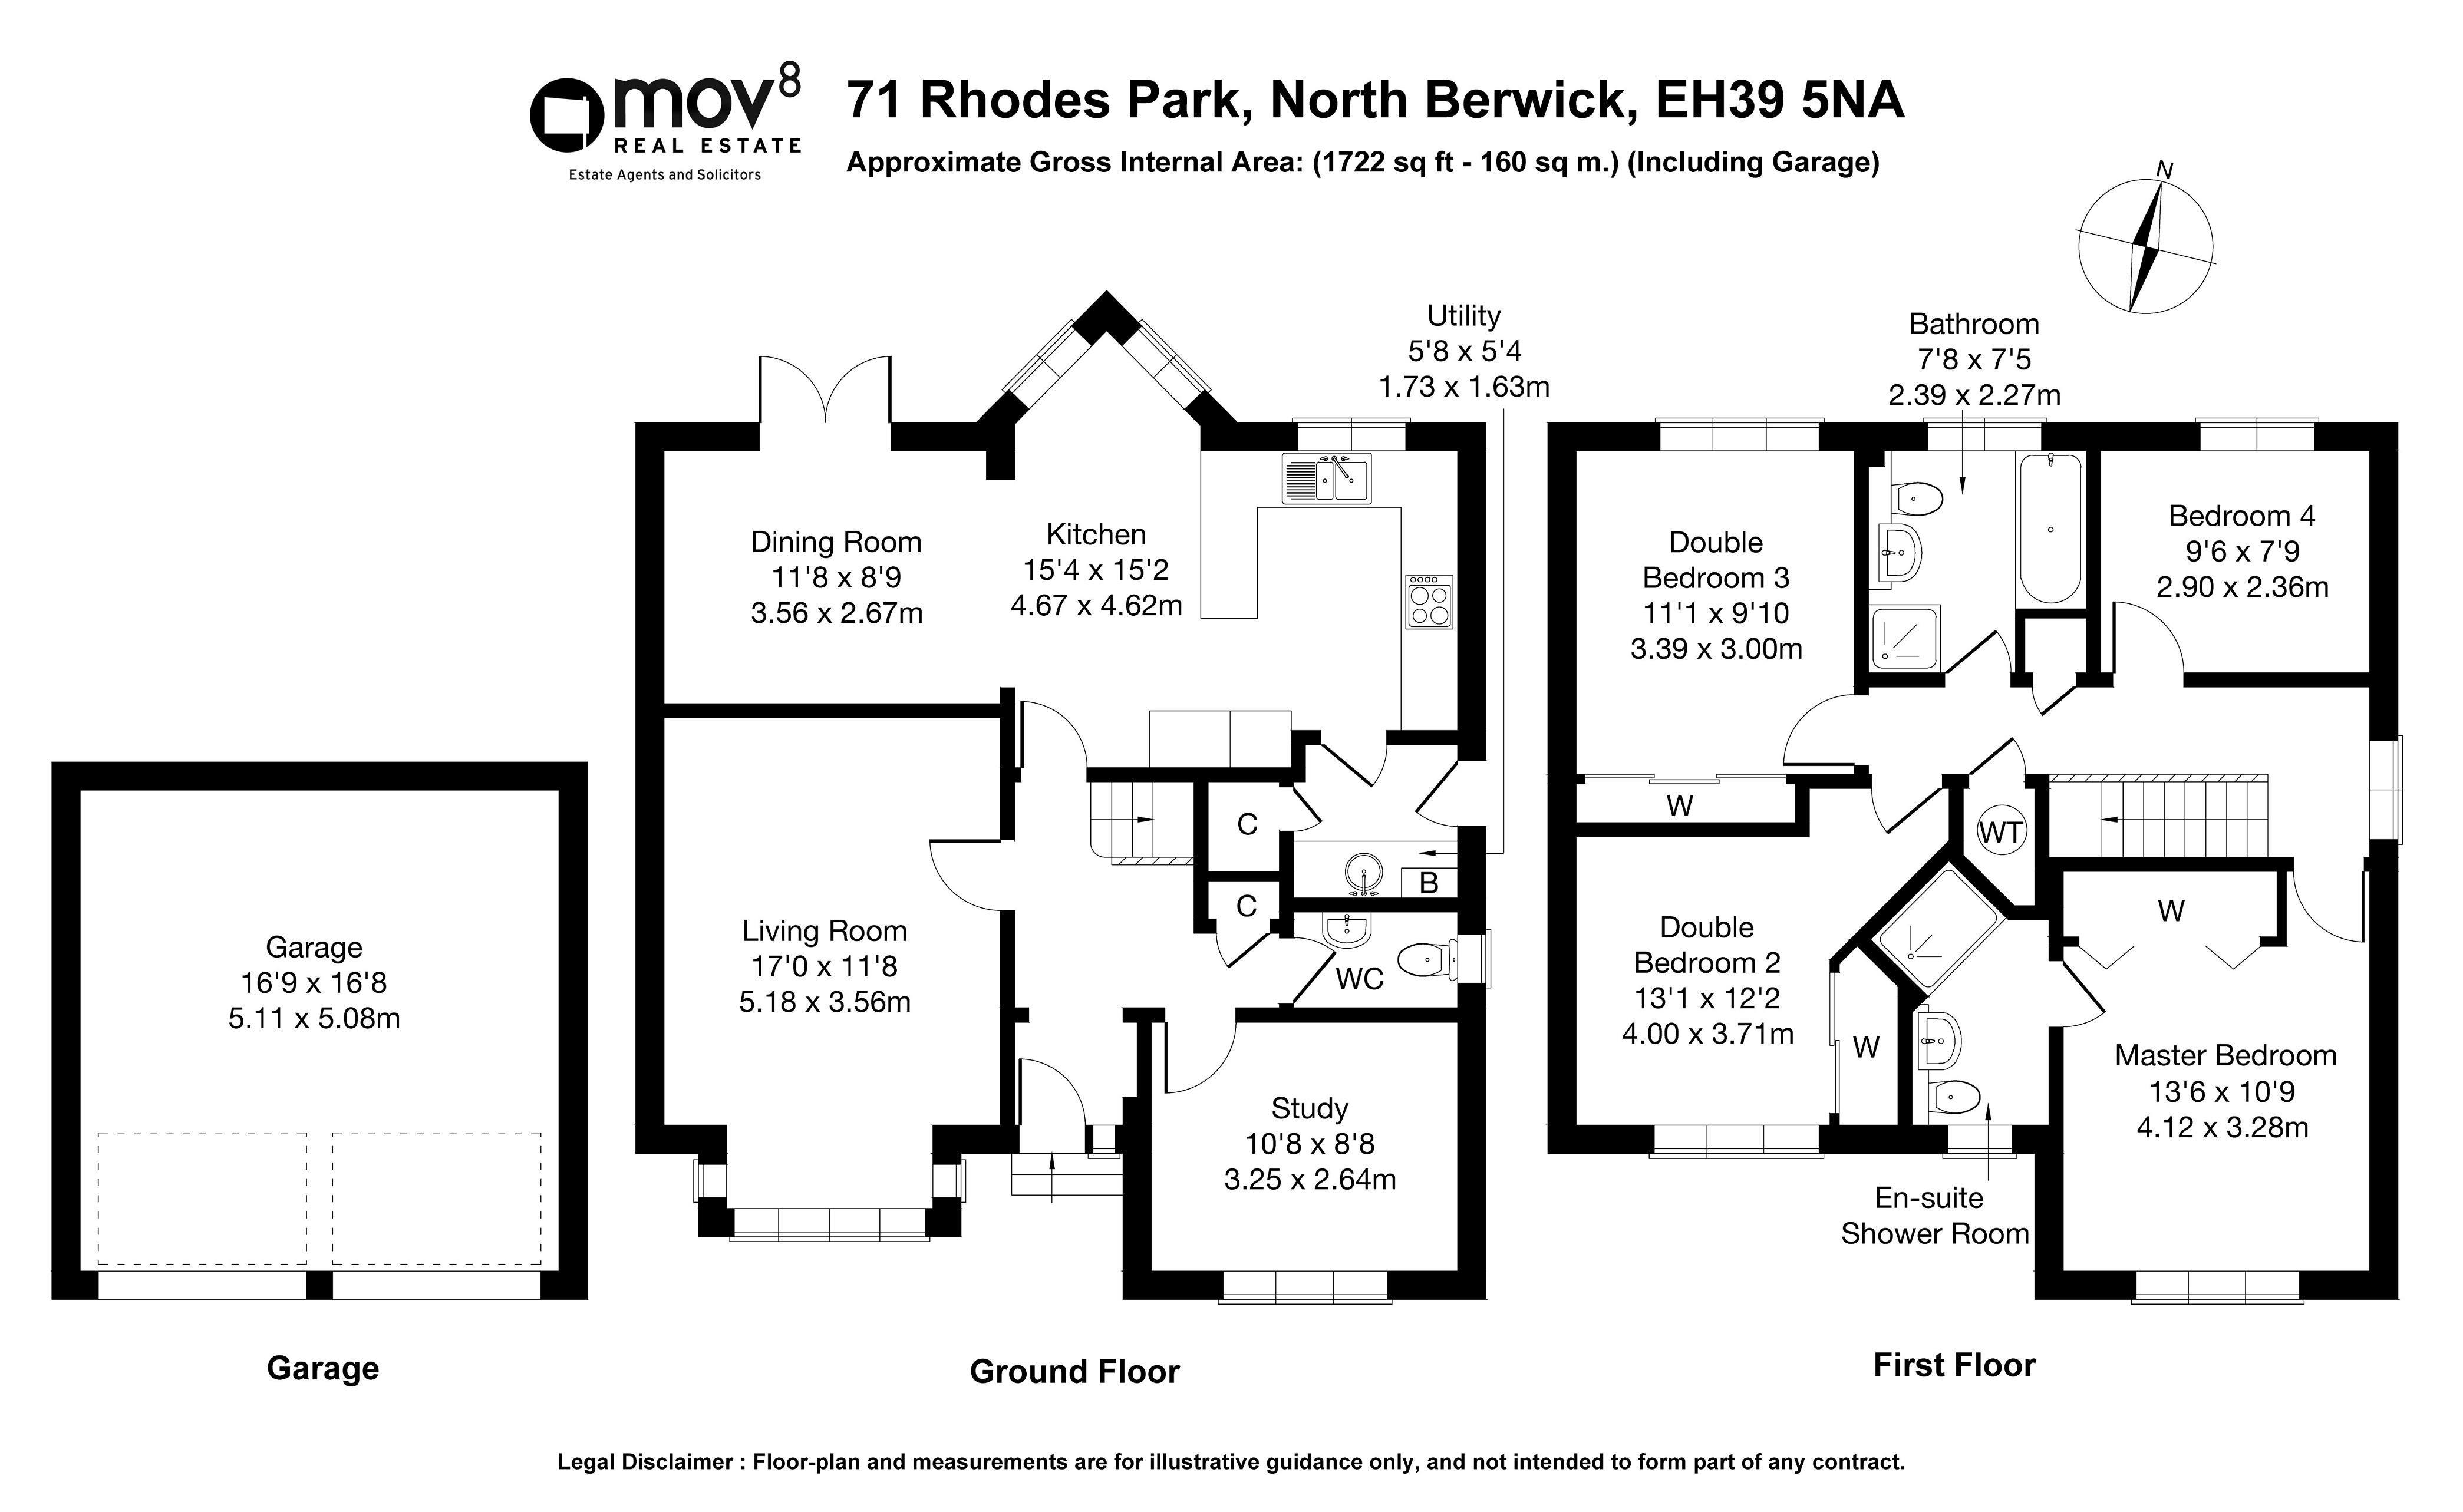 Floorplan 1 of 71 Rhodes Park, North Berwick, East Lothian, EH39 5NA